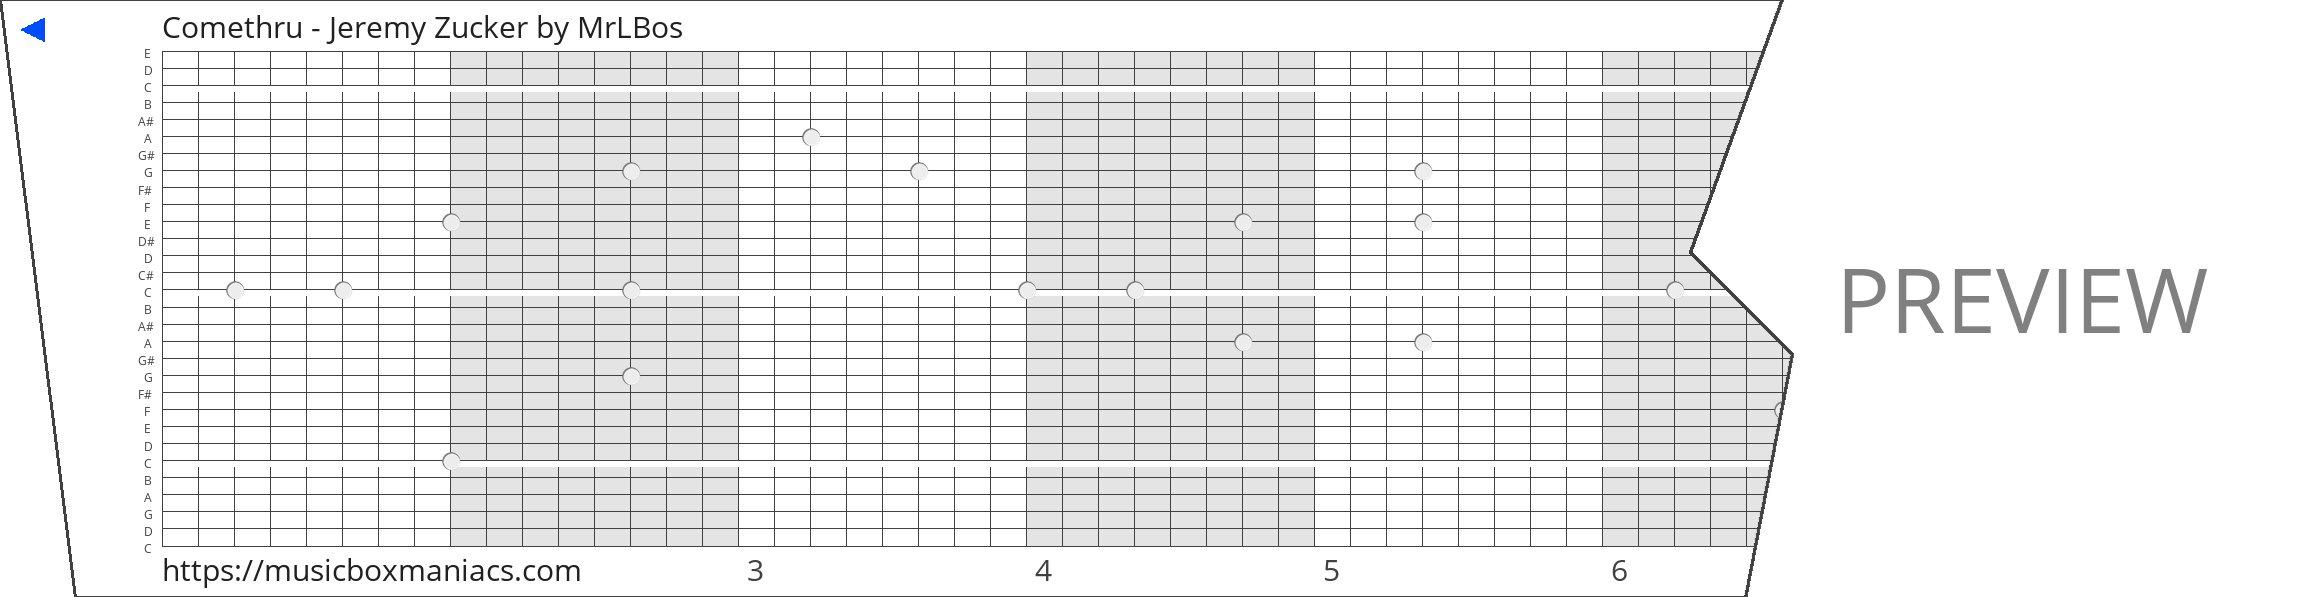 Comethru - Jeremy Zucker 30 note music box paper strip